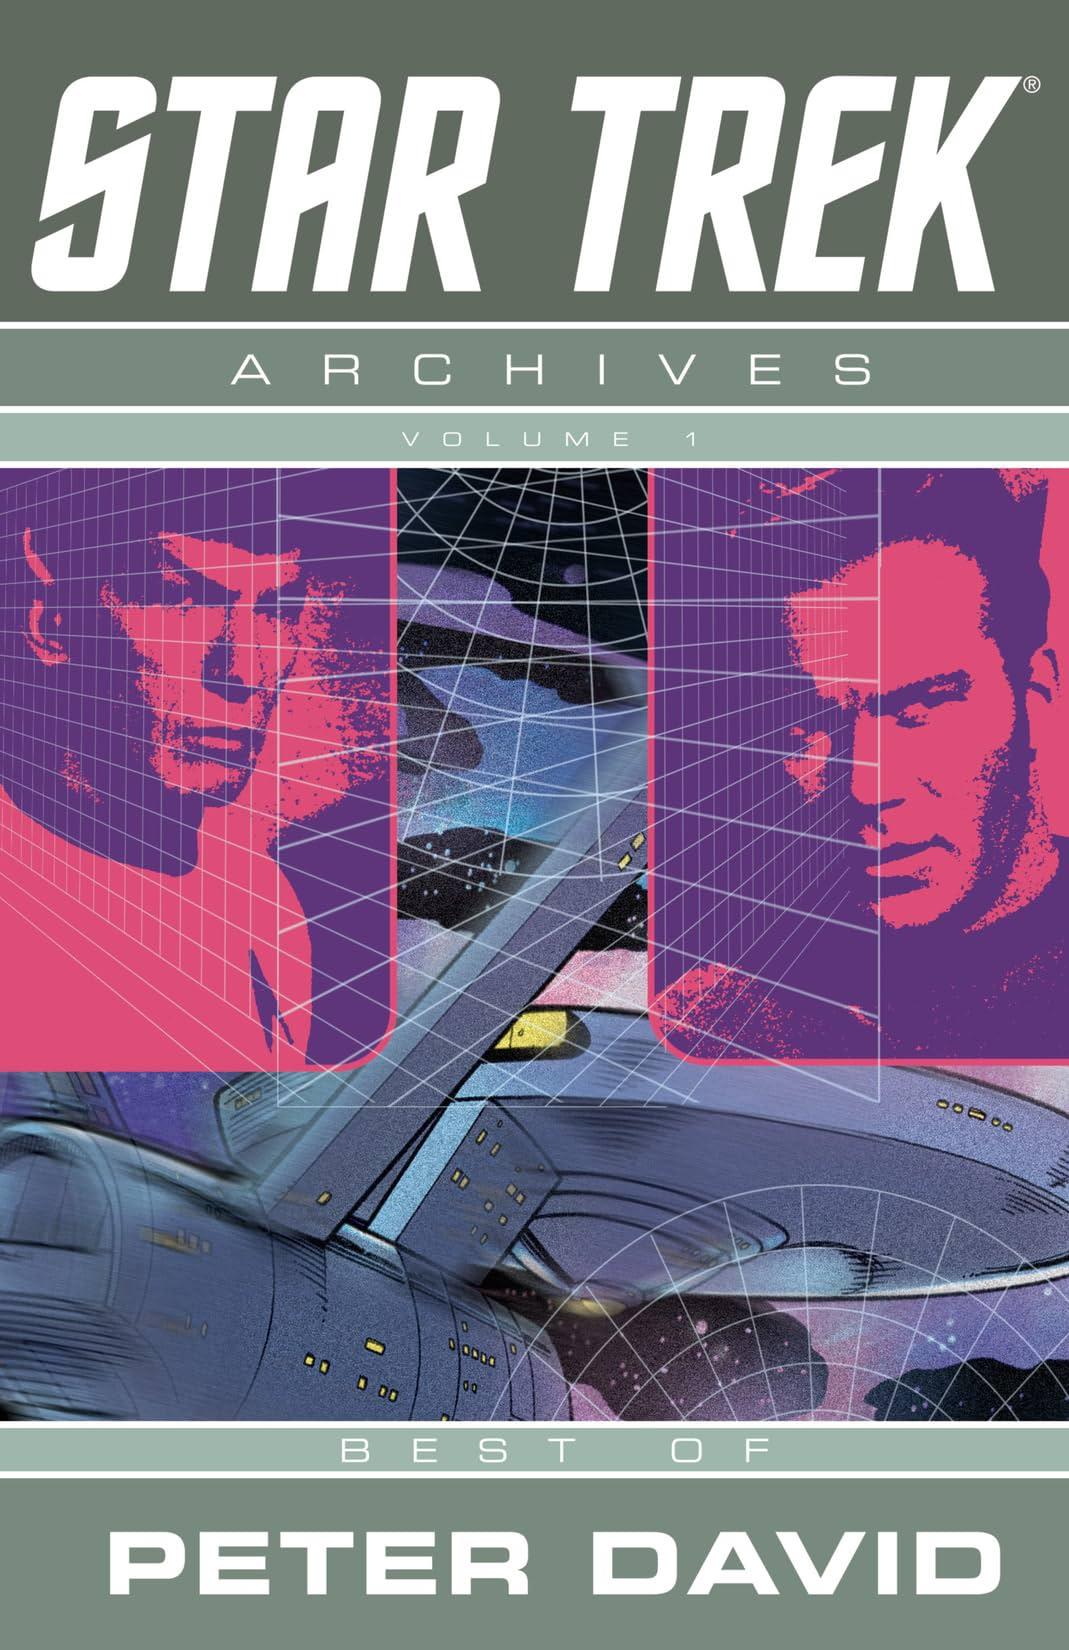 Star Trek Archives Vol. 1: Best of Peter David